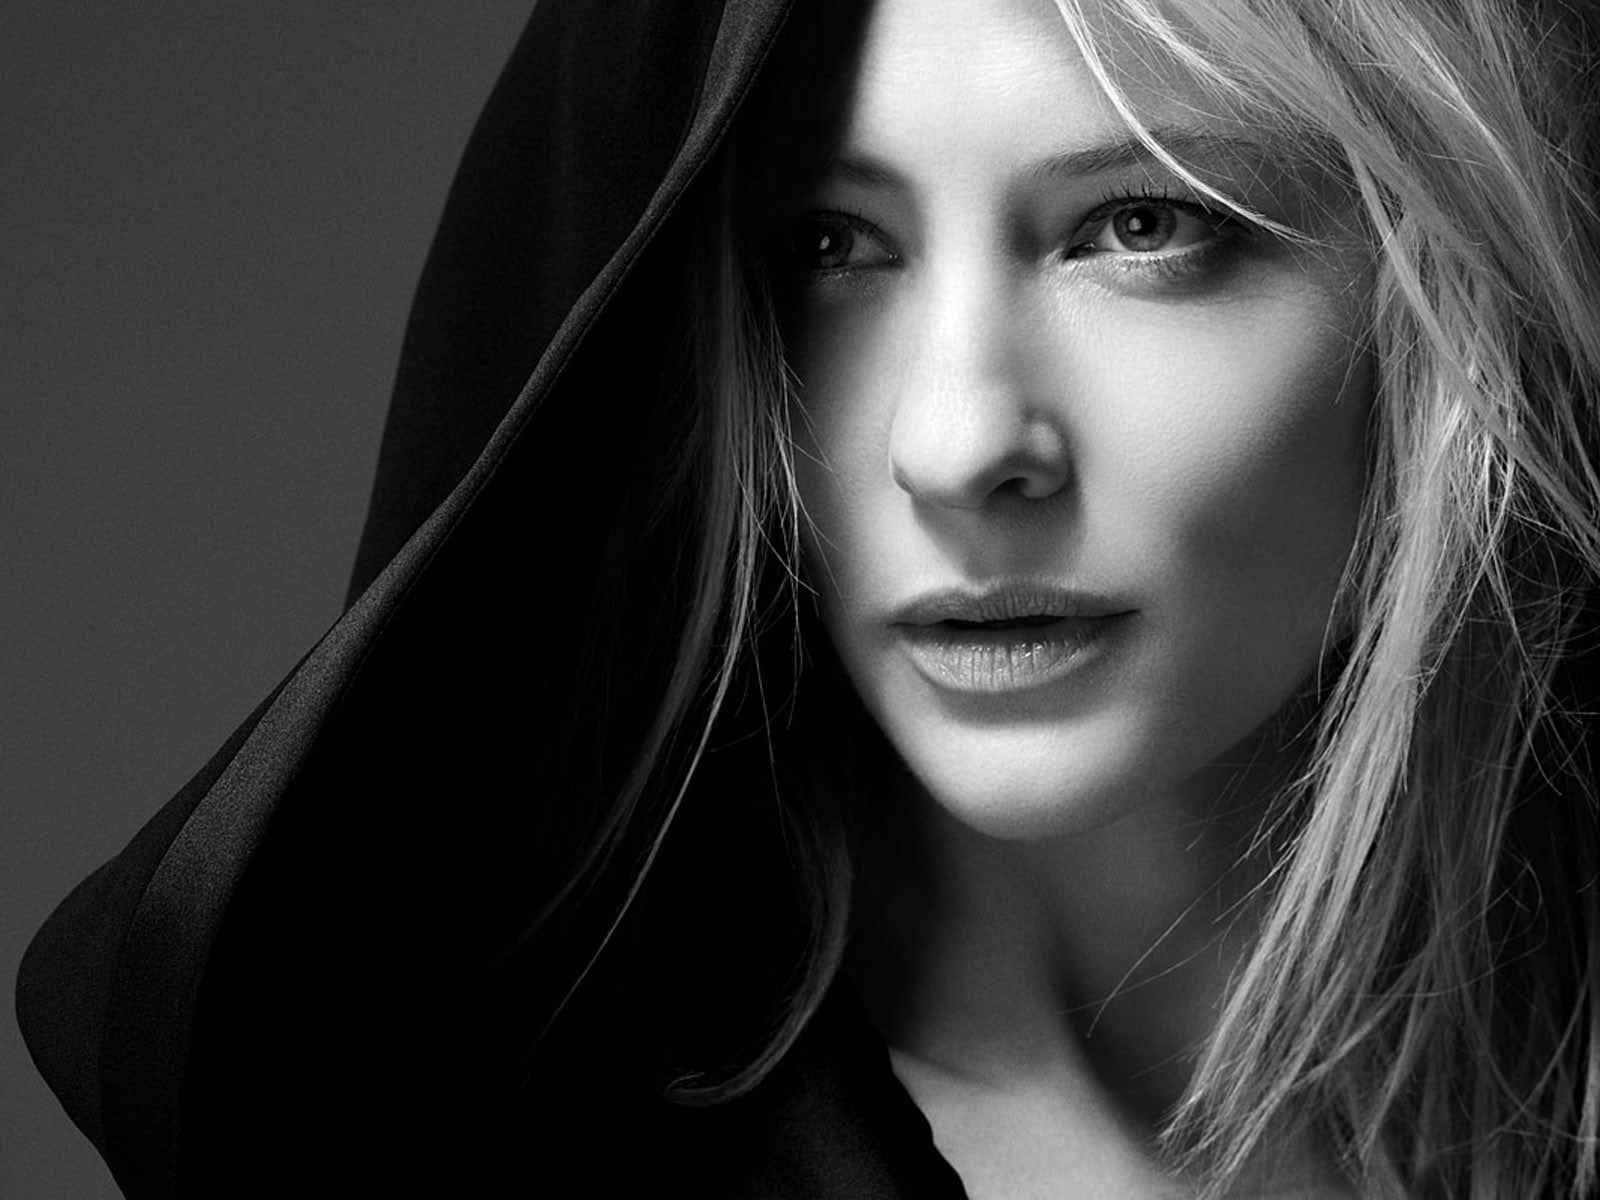 Cate Blanchett Download